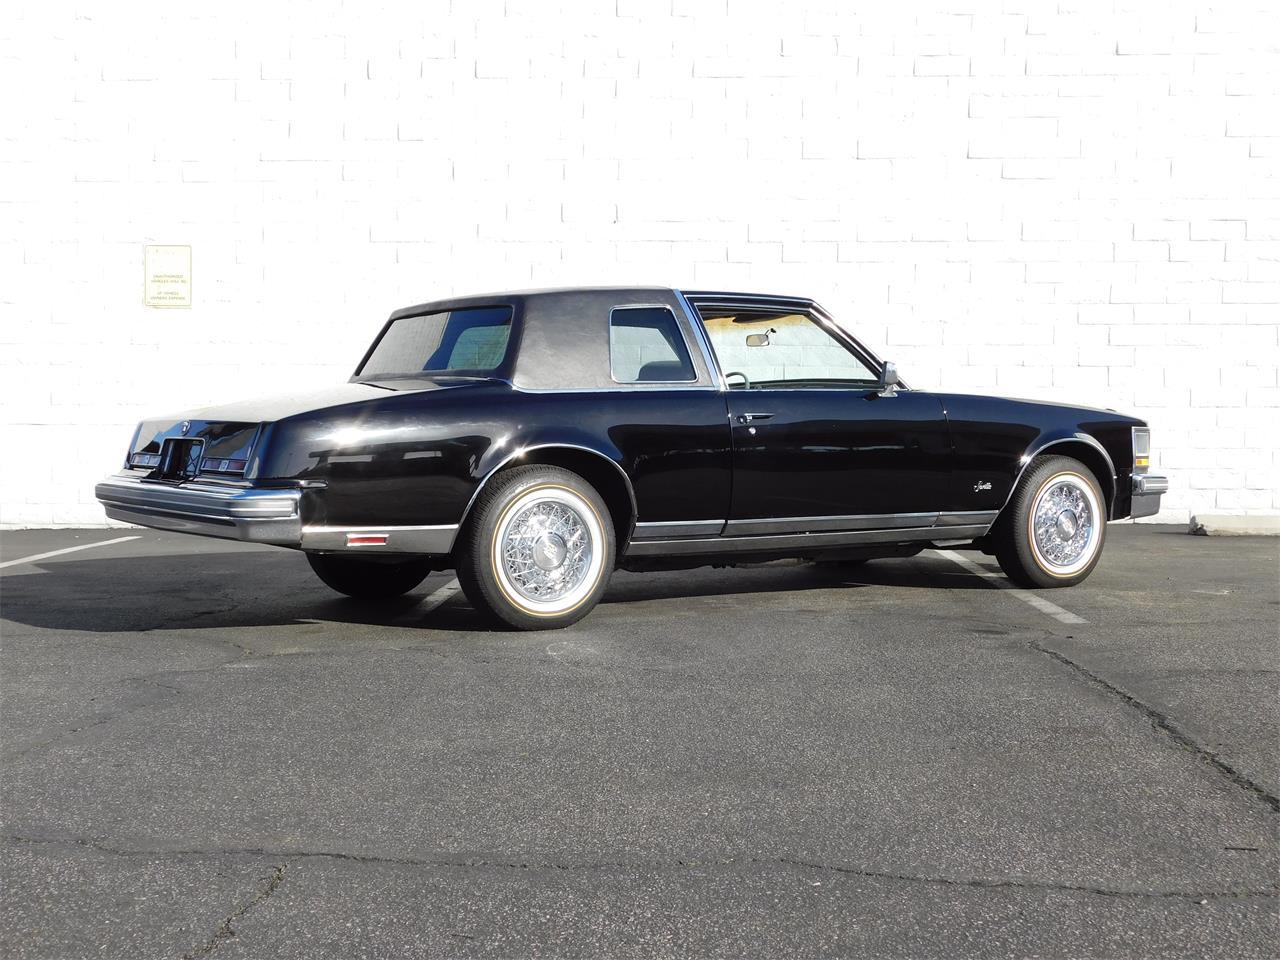 1977 Cadillac Seville for Sale | ClassicCars.com | CC-934552